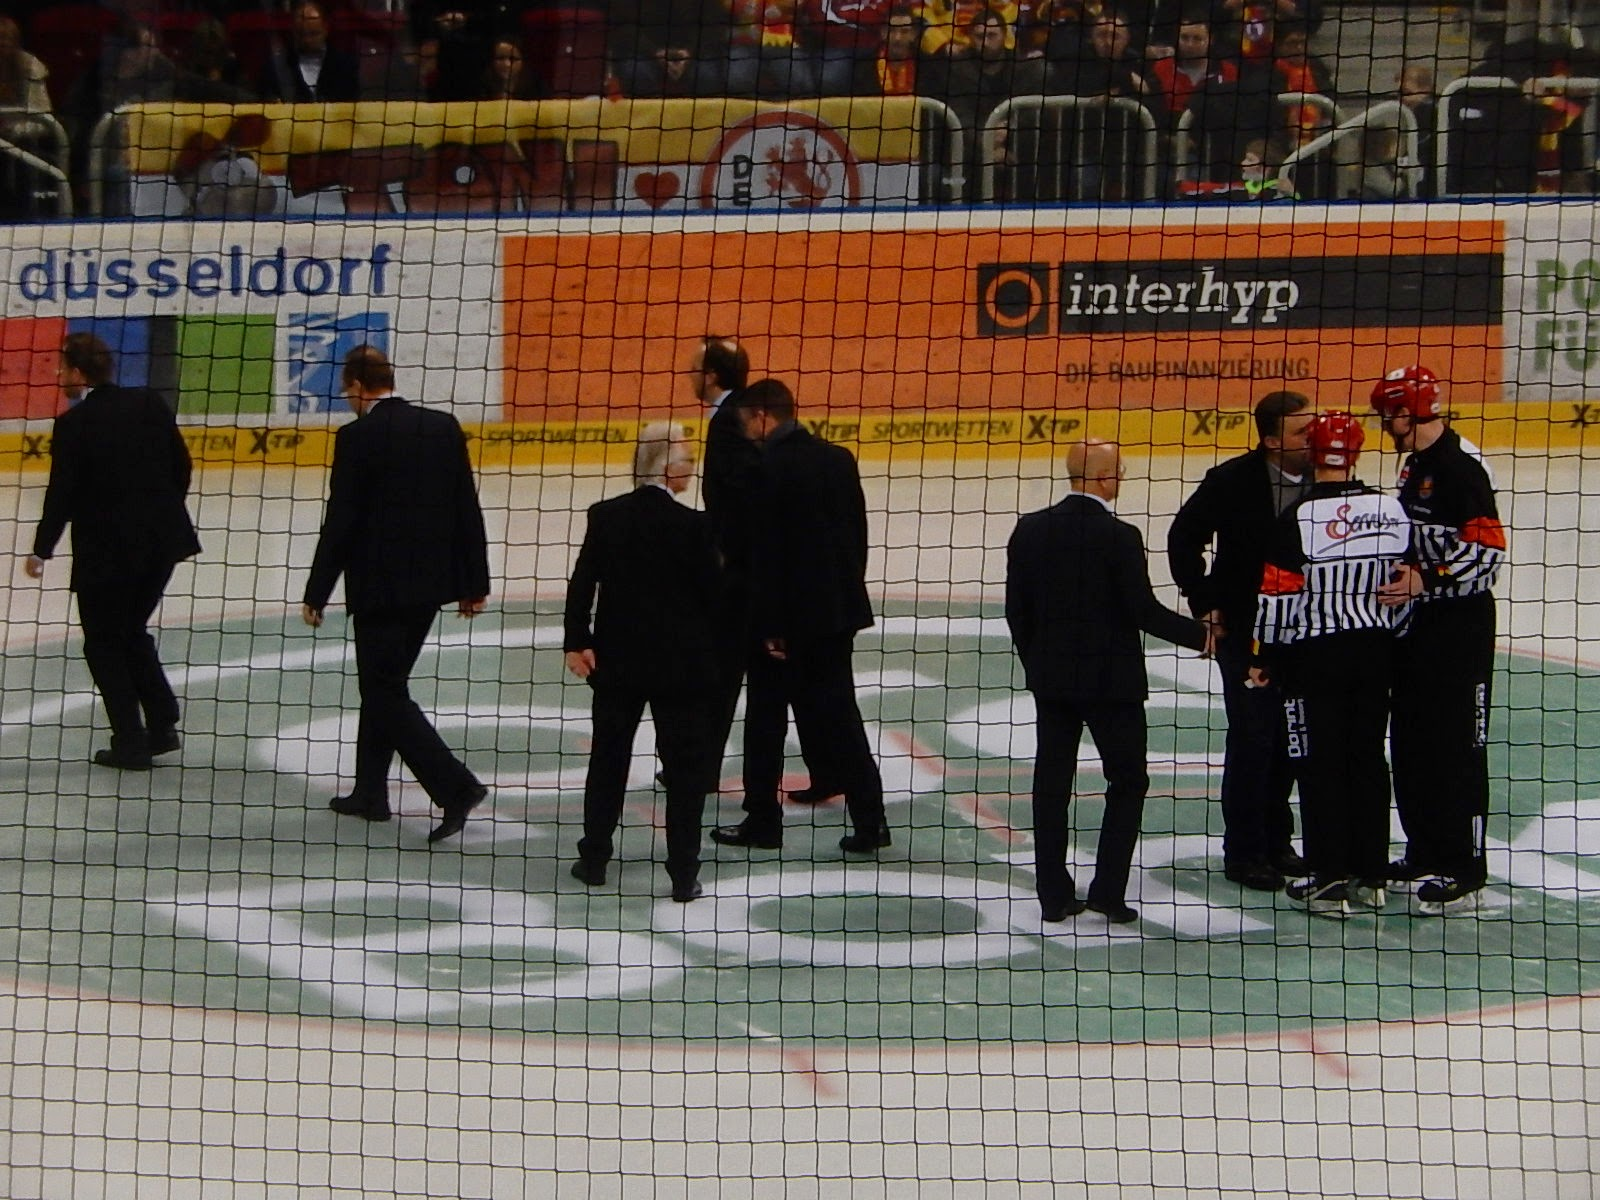 http://www.rp-online.de/sport/eishockey/deg/deg-schlittert-knapp-am-spielabbruch-vorbei-aid-1.4981470